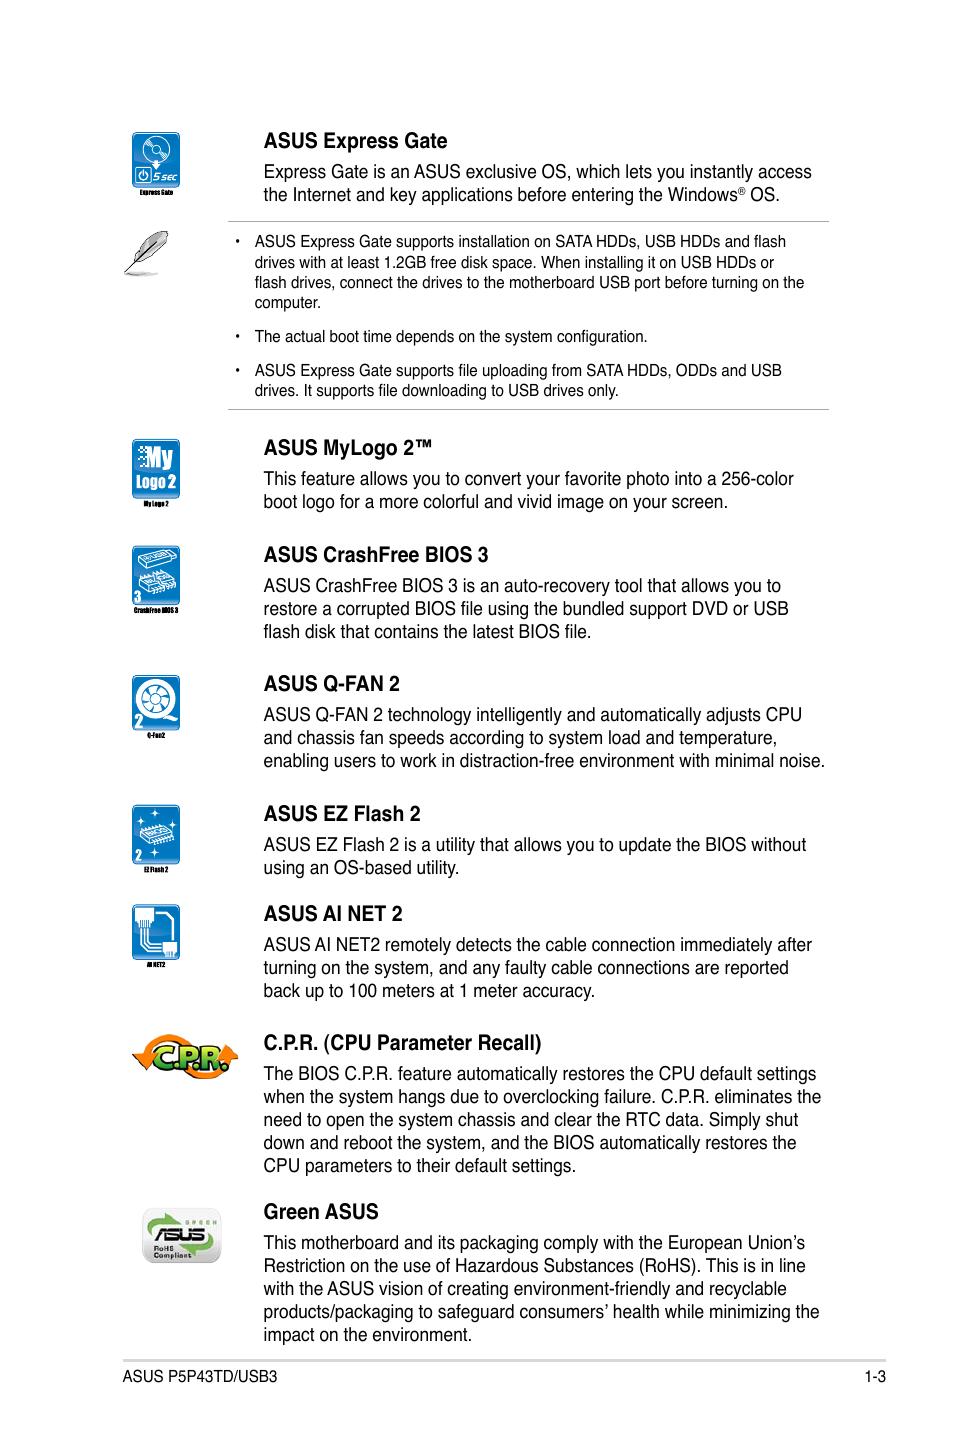 Asus P5P43TD/USB3 User Manual | Page 13 / 64 | Original mode